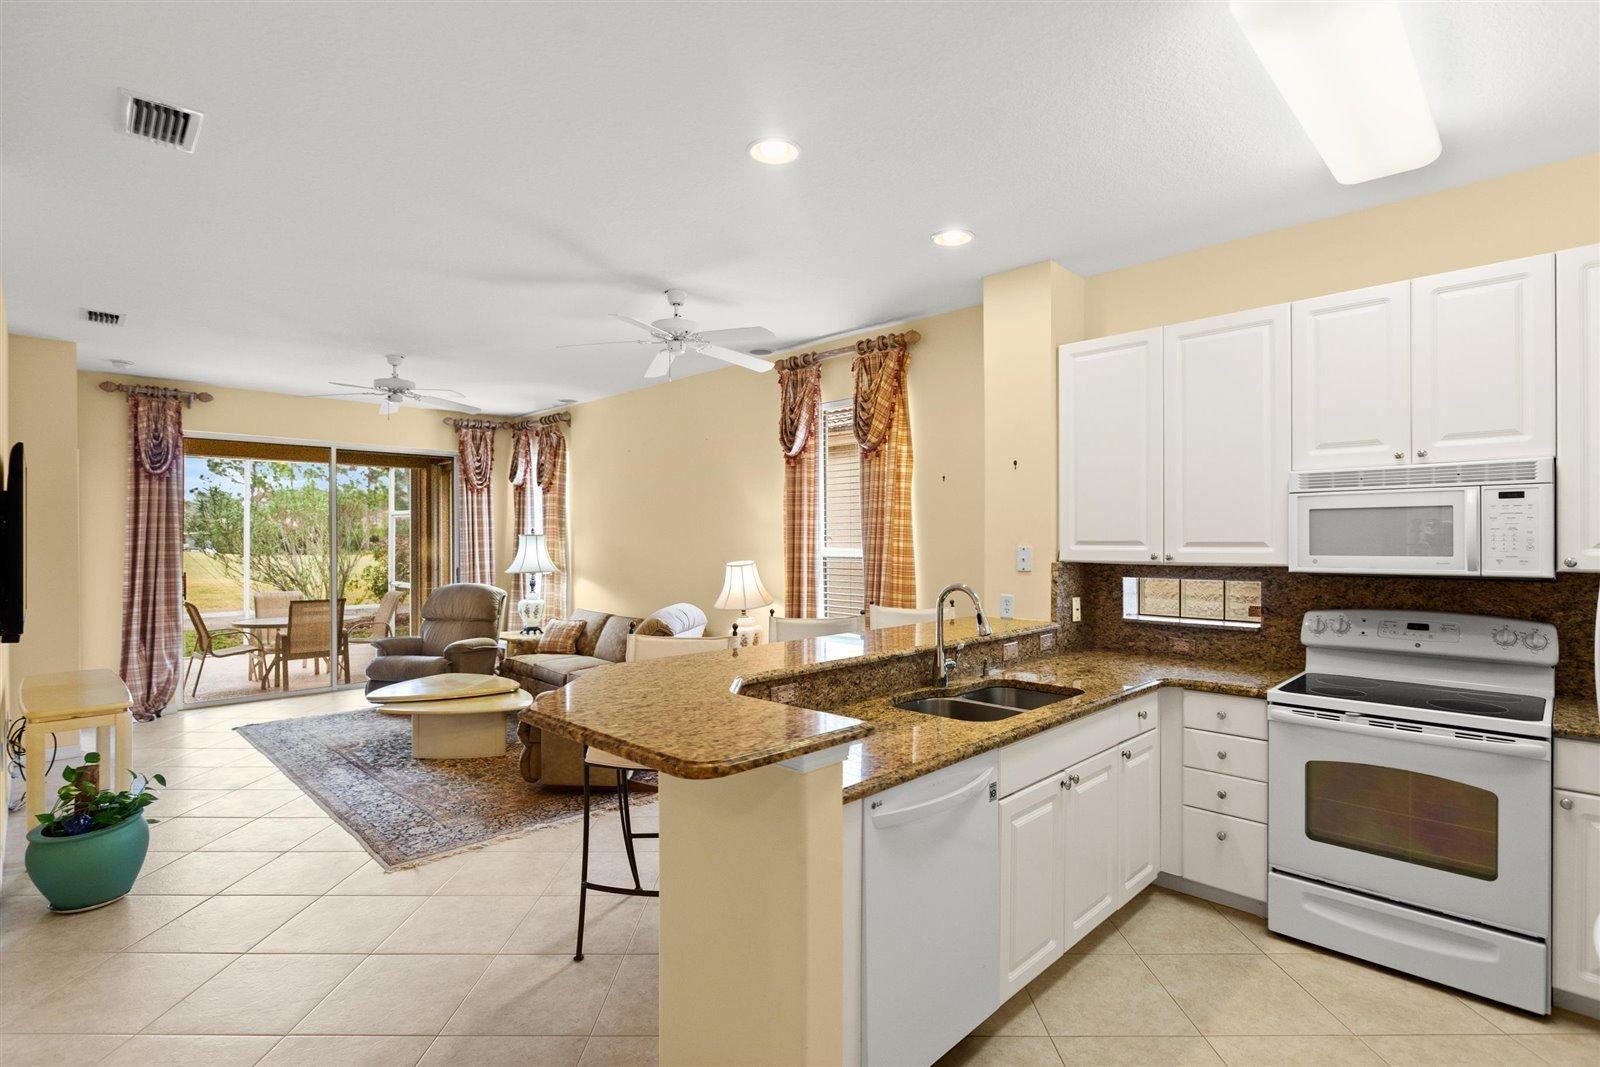 3671 NW Willow Creek Drive, Jensen Beach, FL 34957 - #: RX-10684821